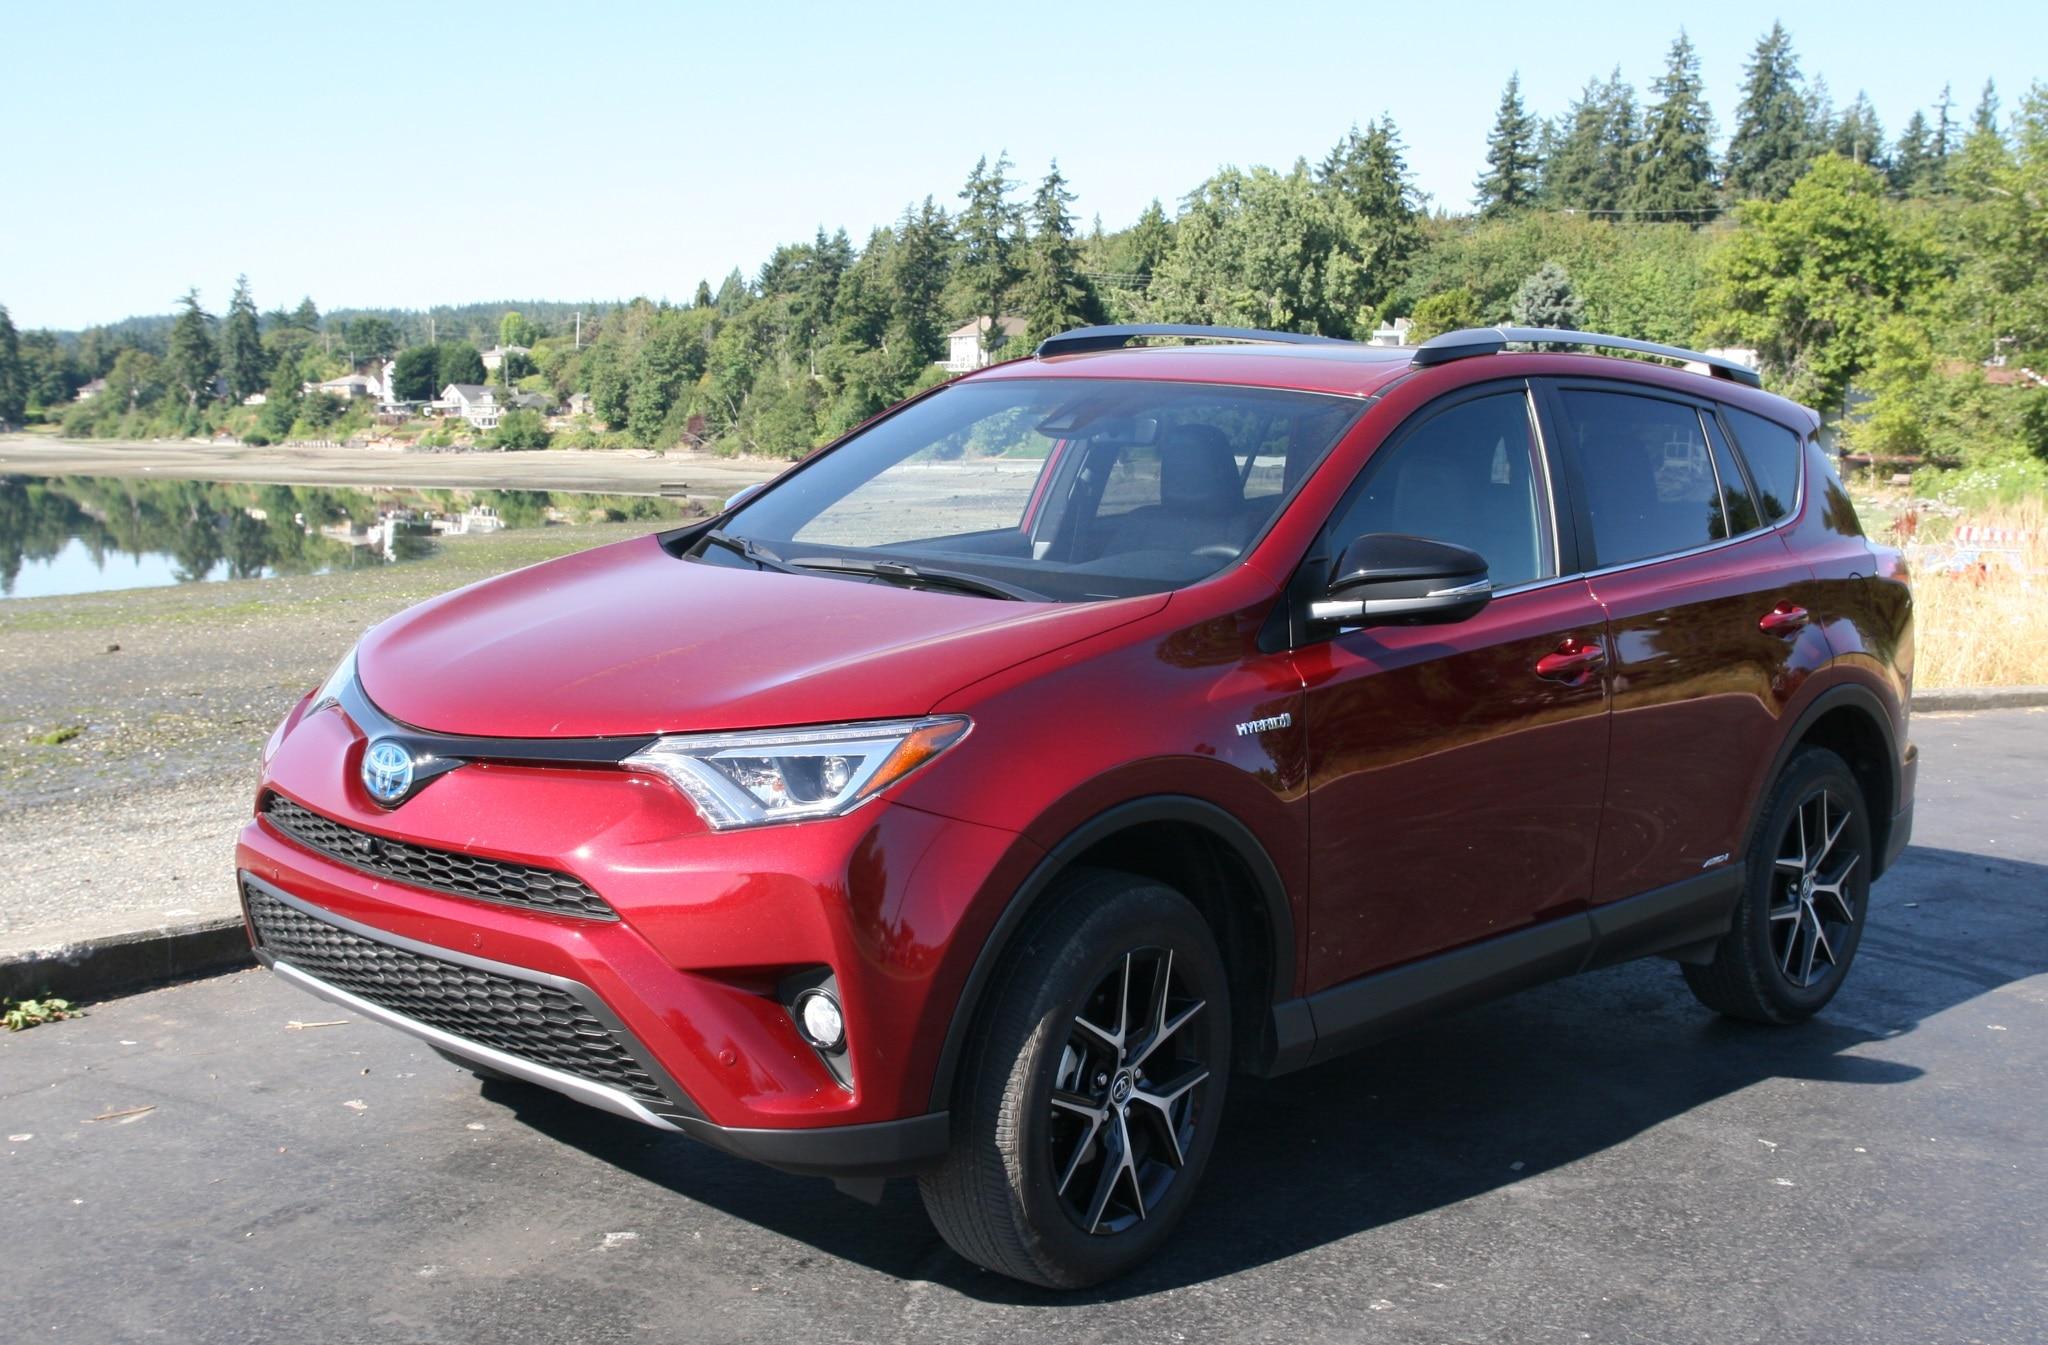 2018 Toyota Rav4 Hybrid Front Three Quarter Driver Side